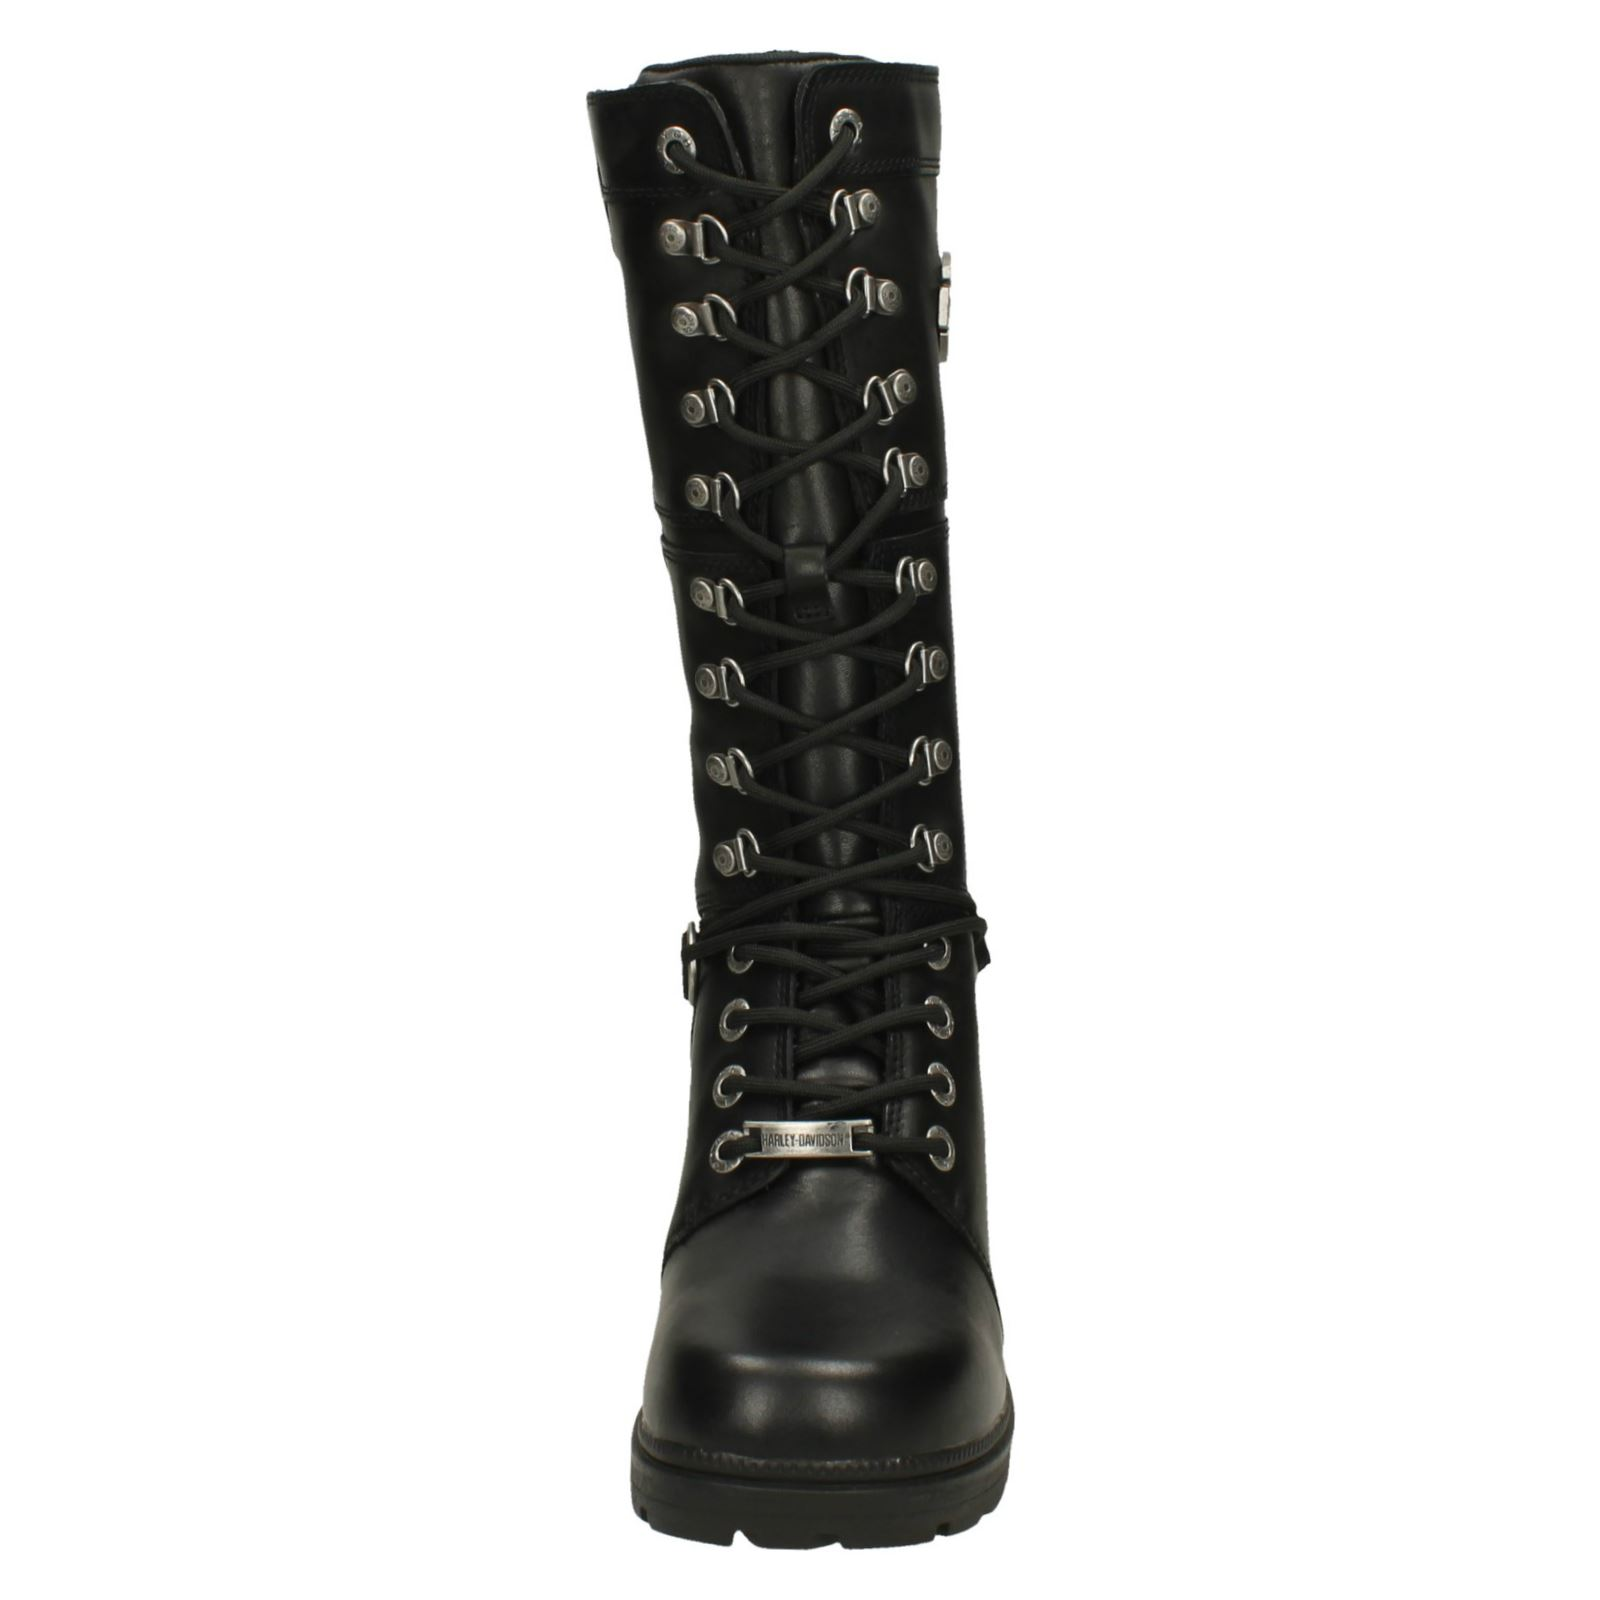 Womens Harley Davidson Davidson Davidson Long Boots *Harland D83987* 11ff7d